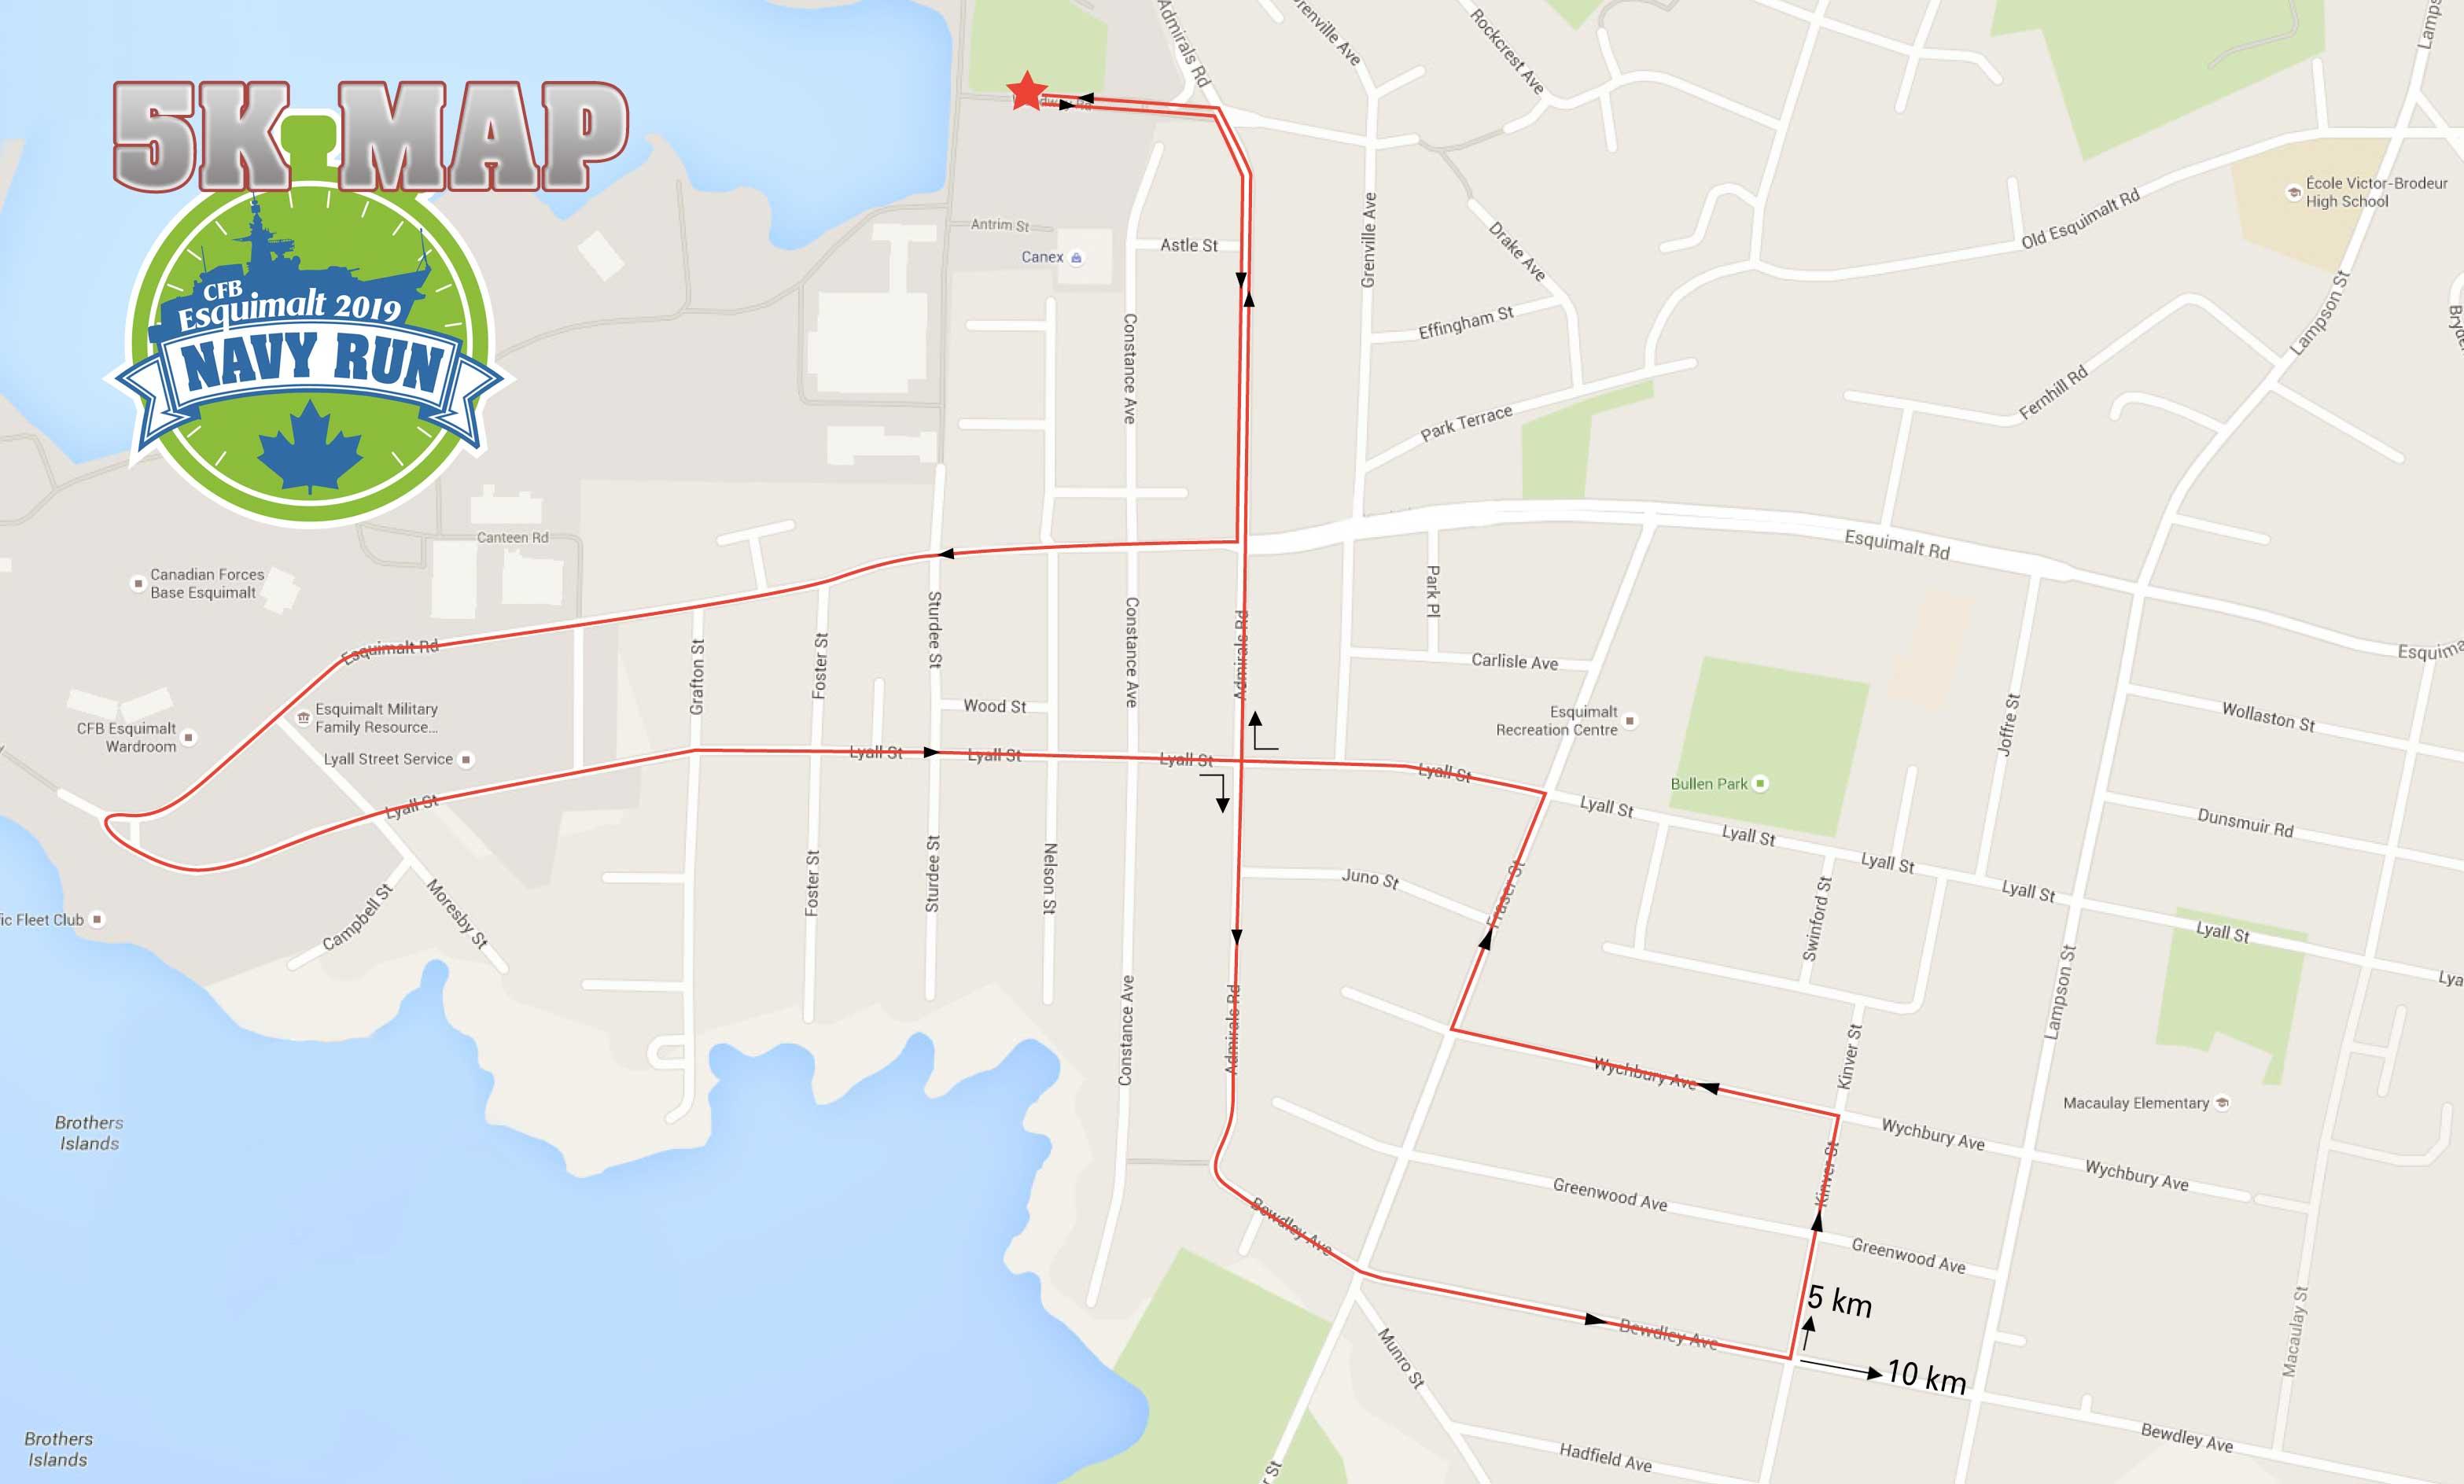 Esquimalt Navy Run 2019 5 km route map